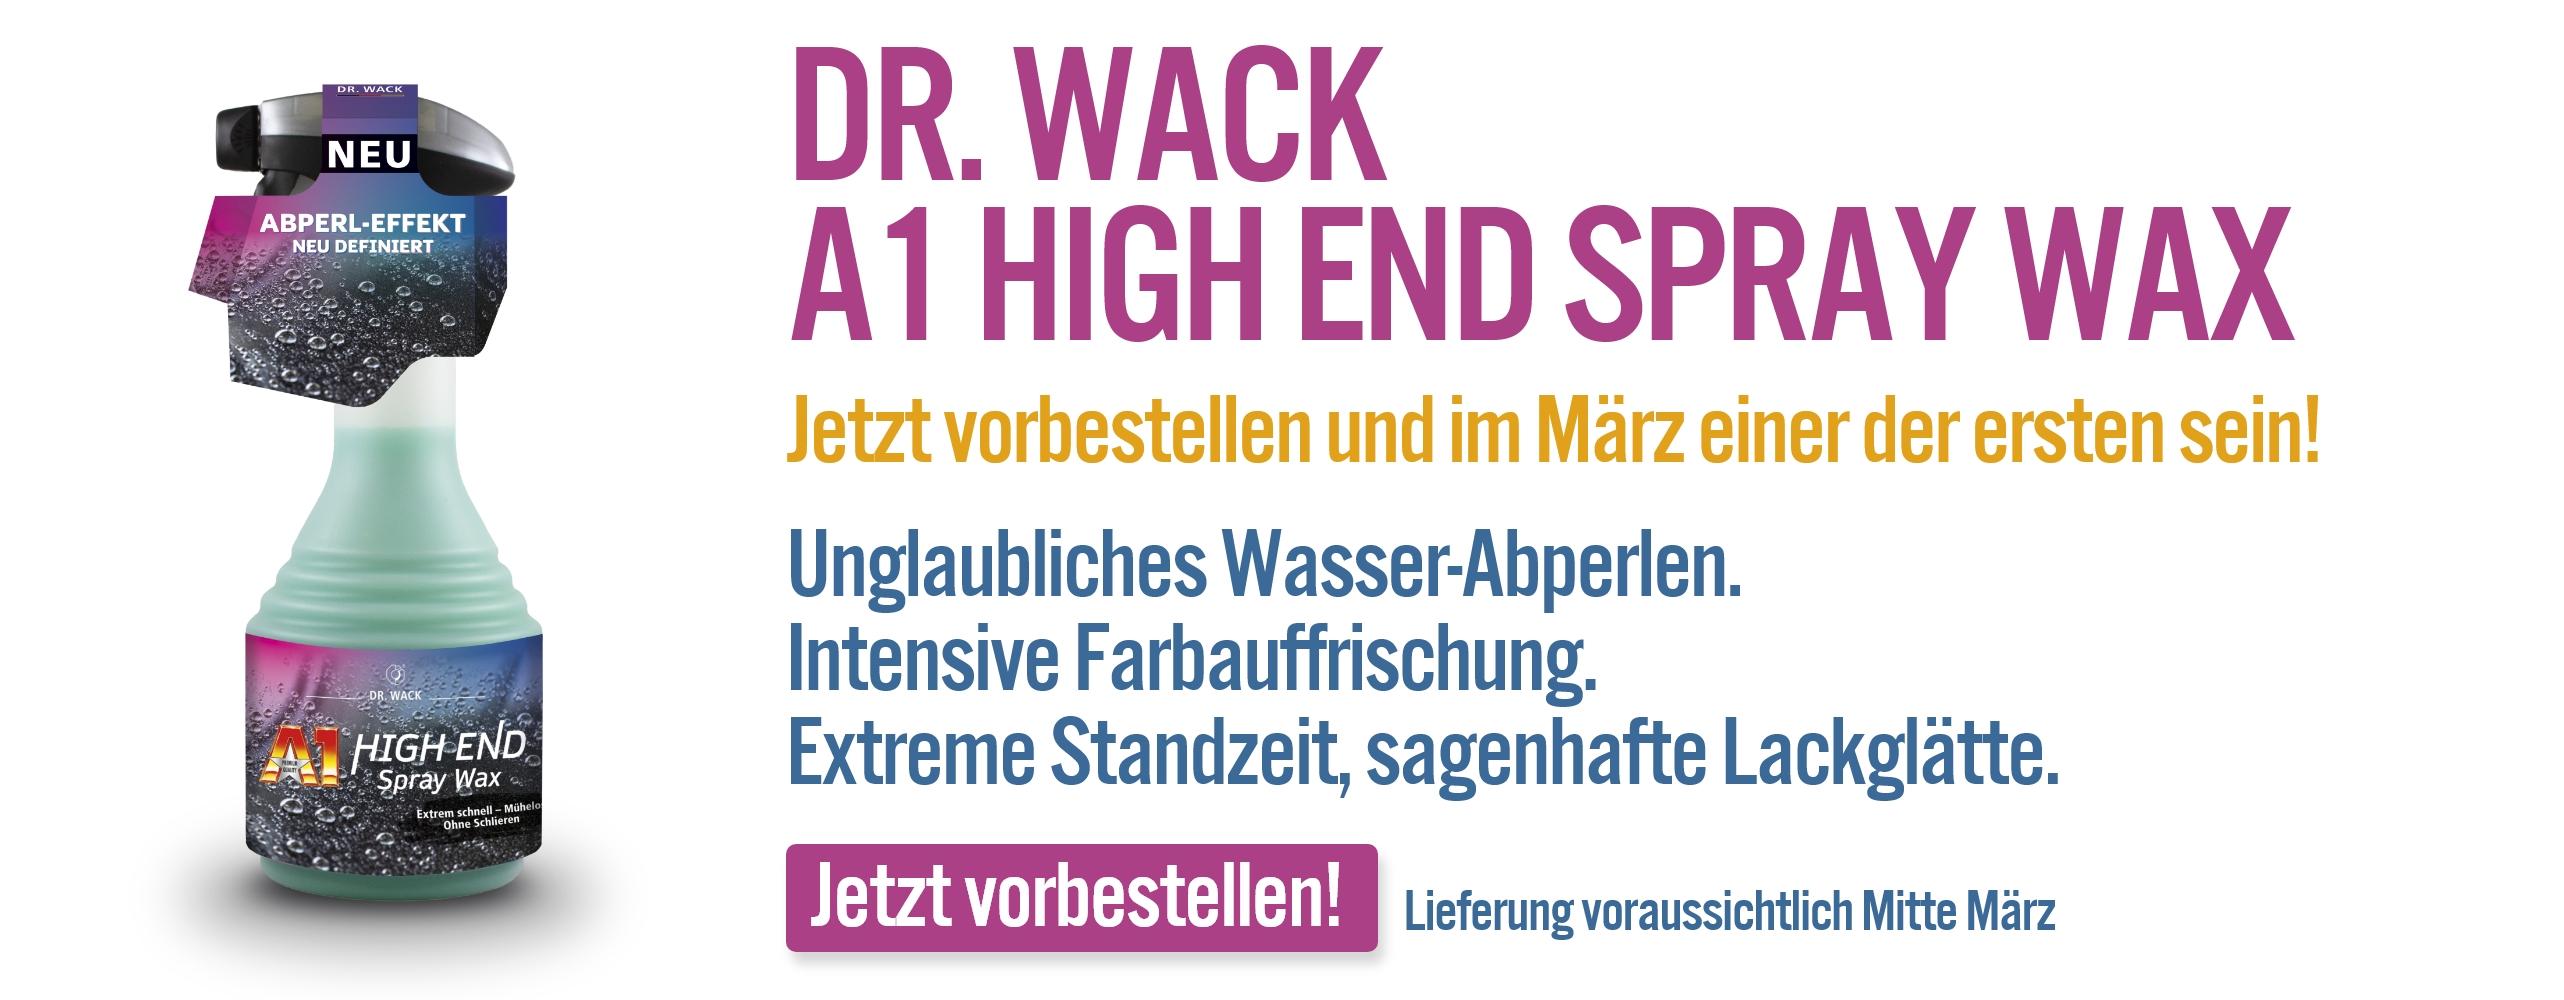 Dr. Wack A1 High End Spray Wax